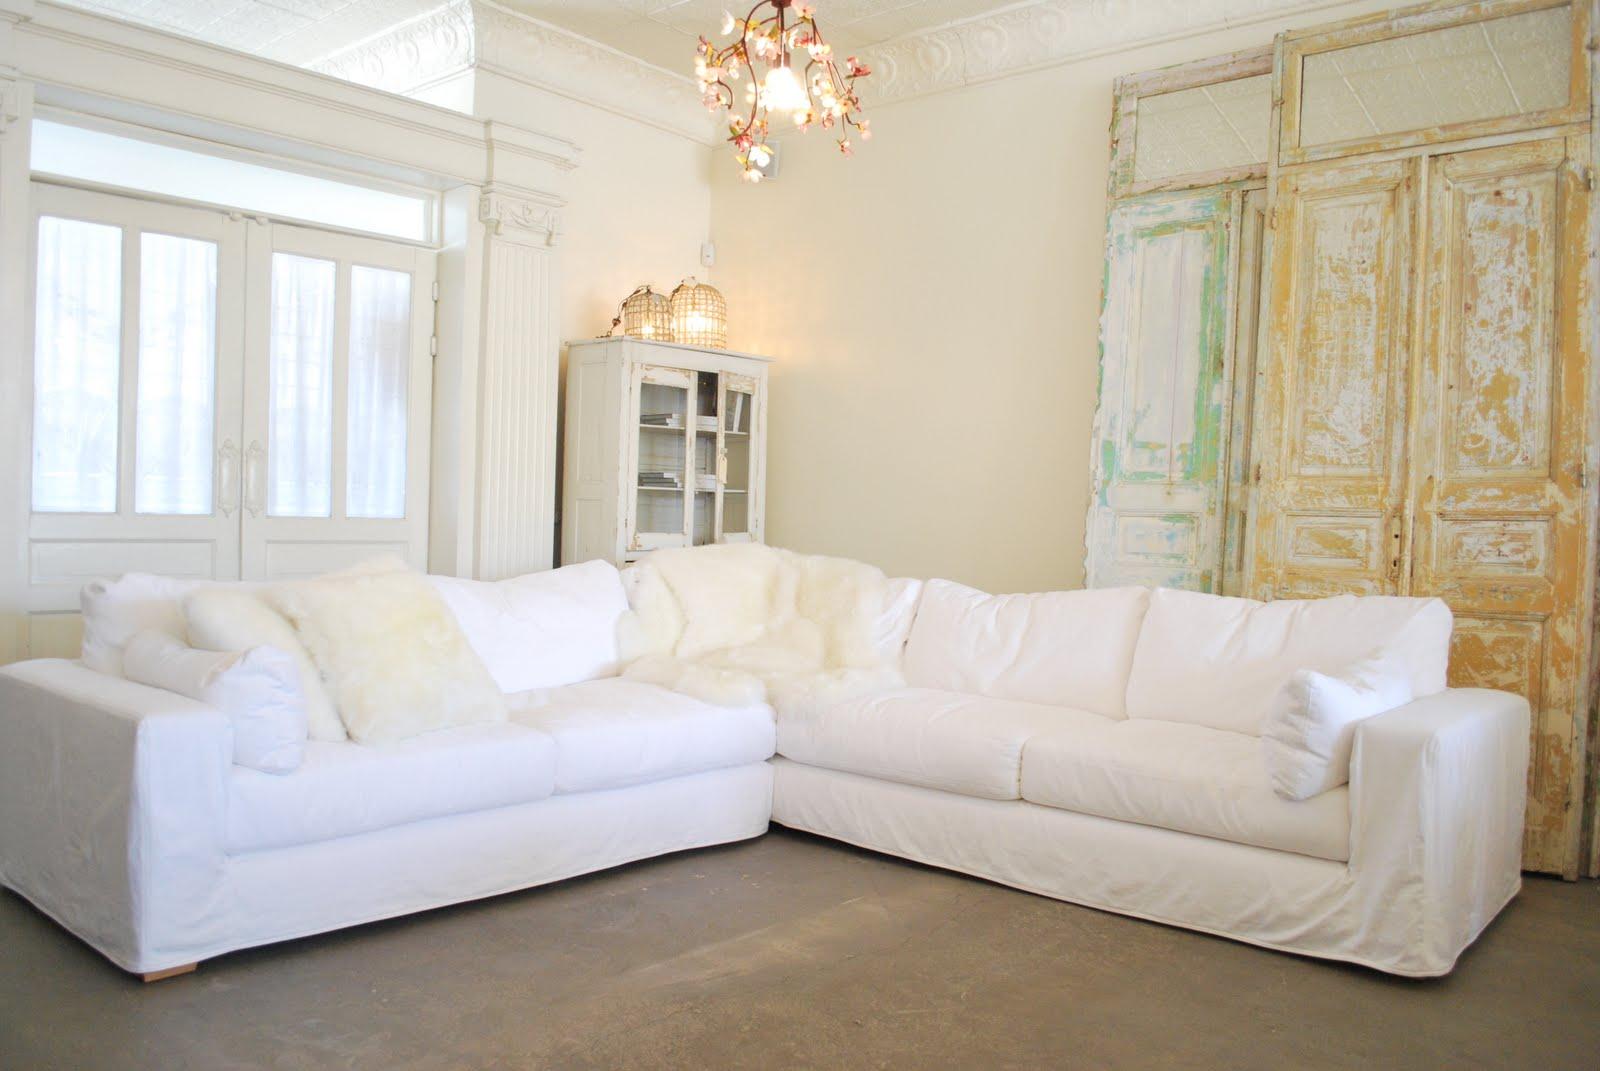 chic sofas black sofa covers australia fiona and twig rachel returns a ashwell shabby